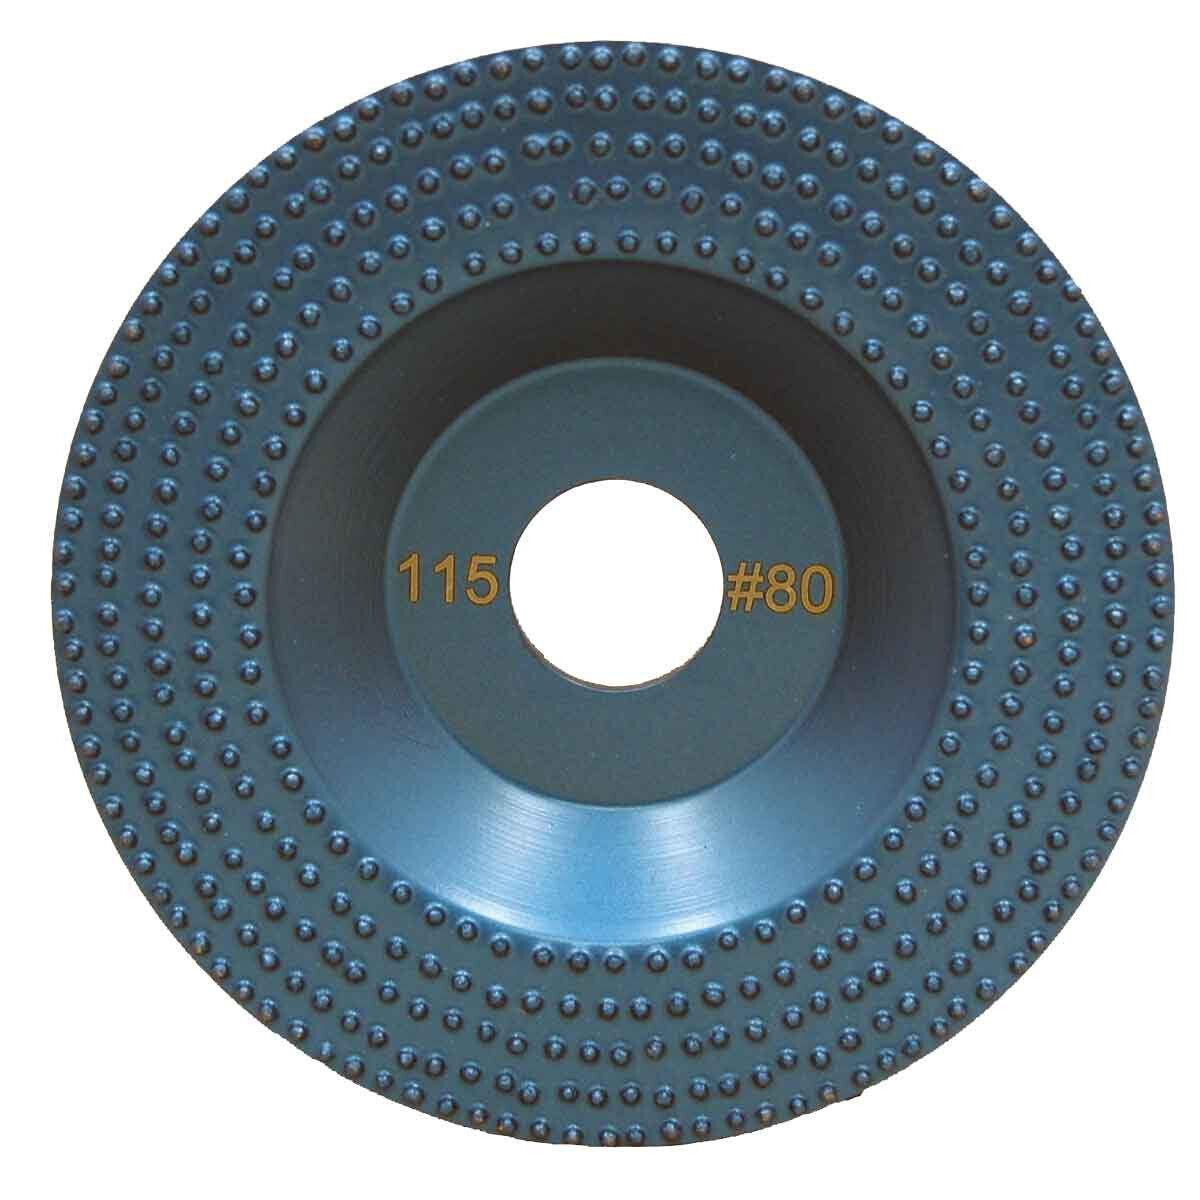 DITEQ 5 inch Vacuum Brazed Spike Disc - 80 Grit